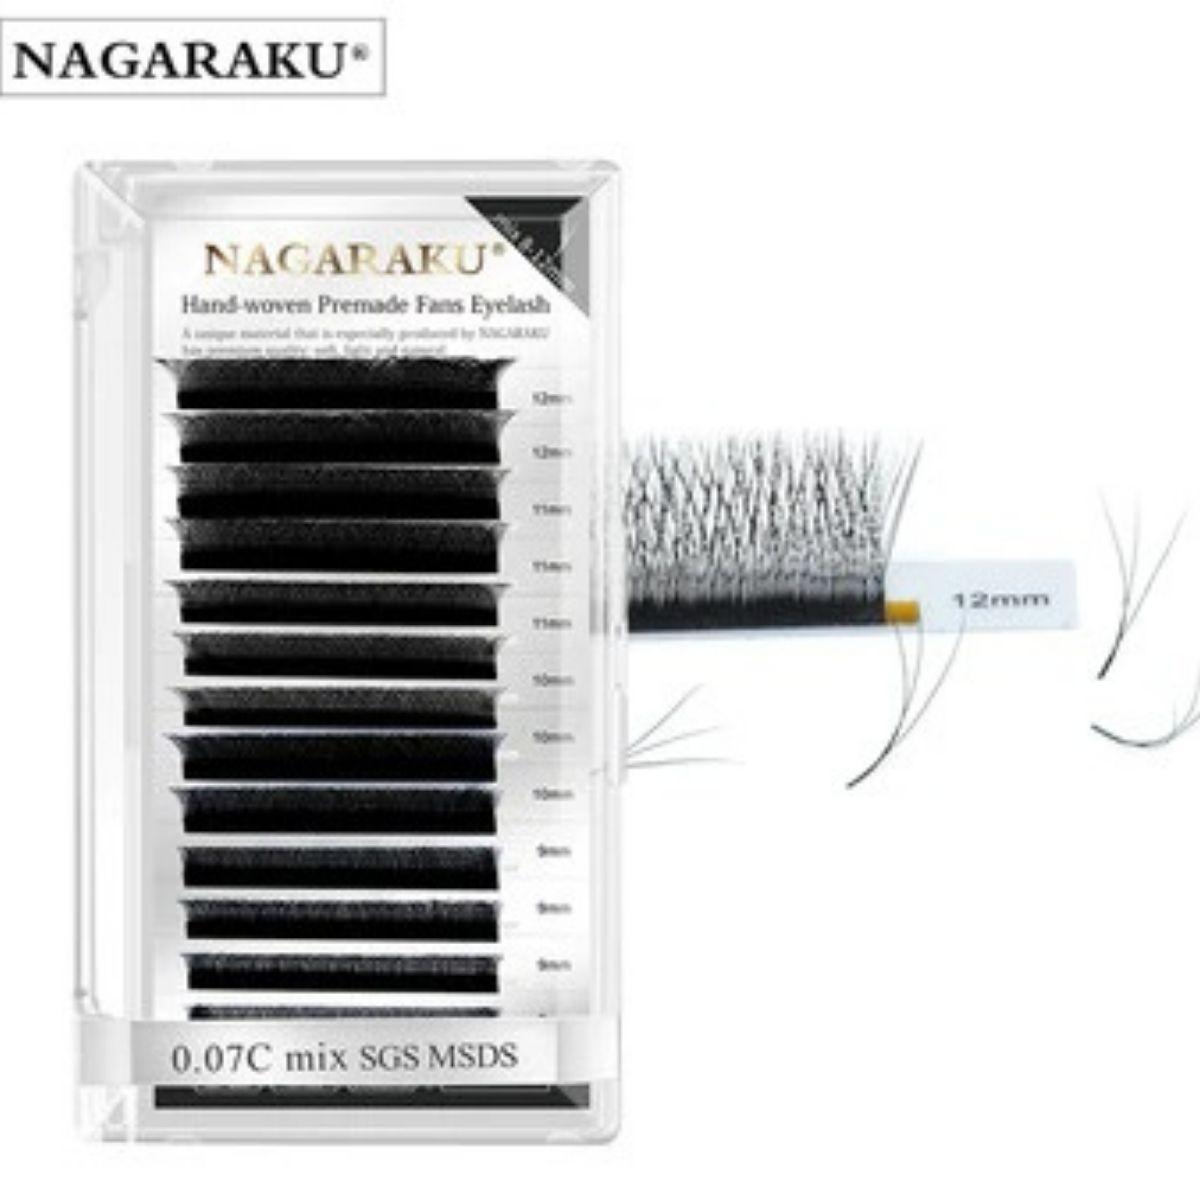 Cílios em W Volume Brasileiro Mix 8 a 12mm Nagaraku